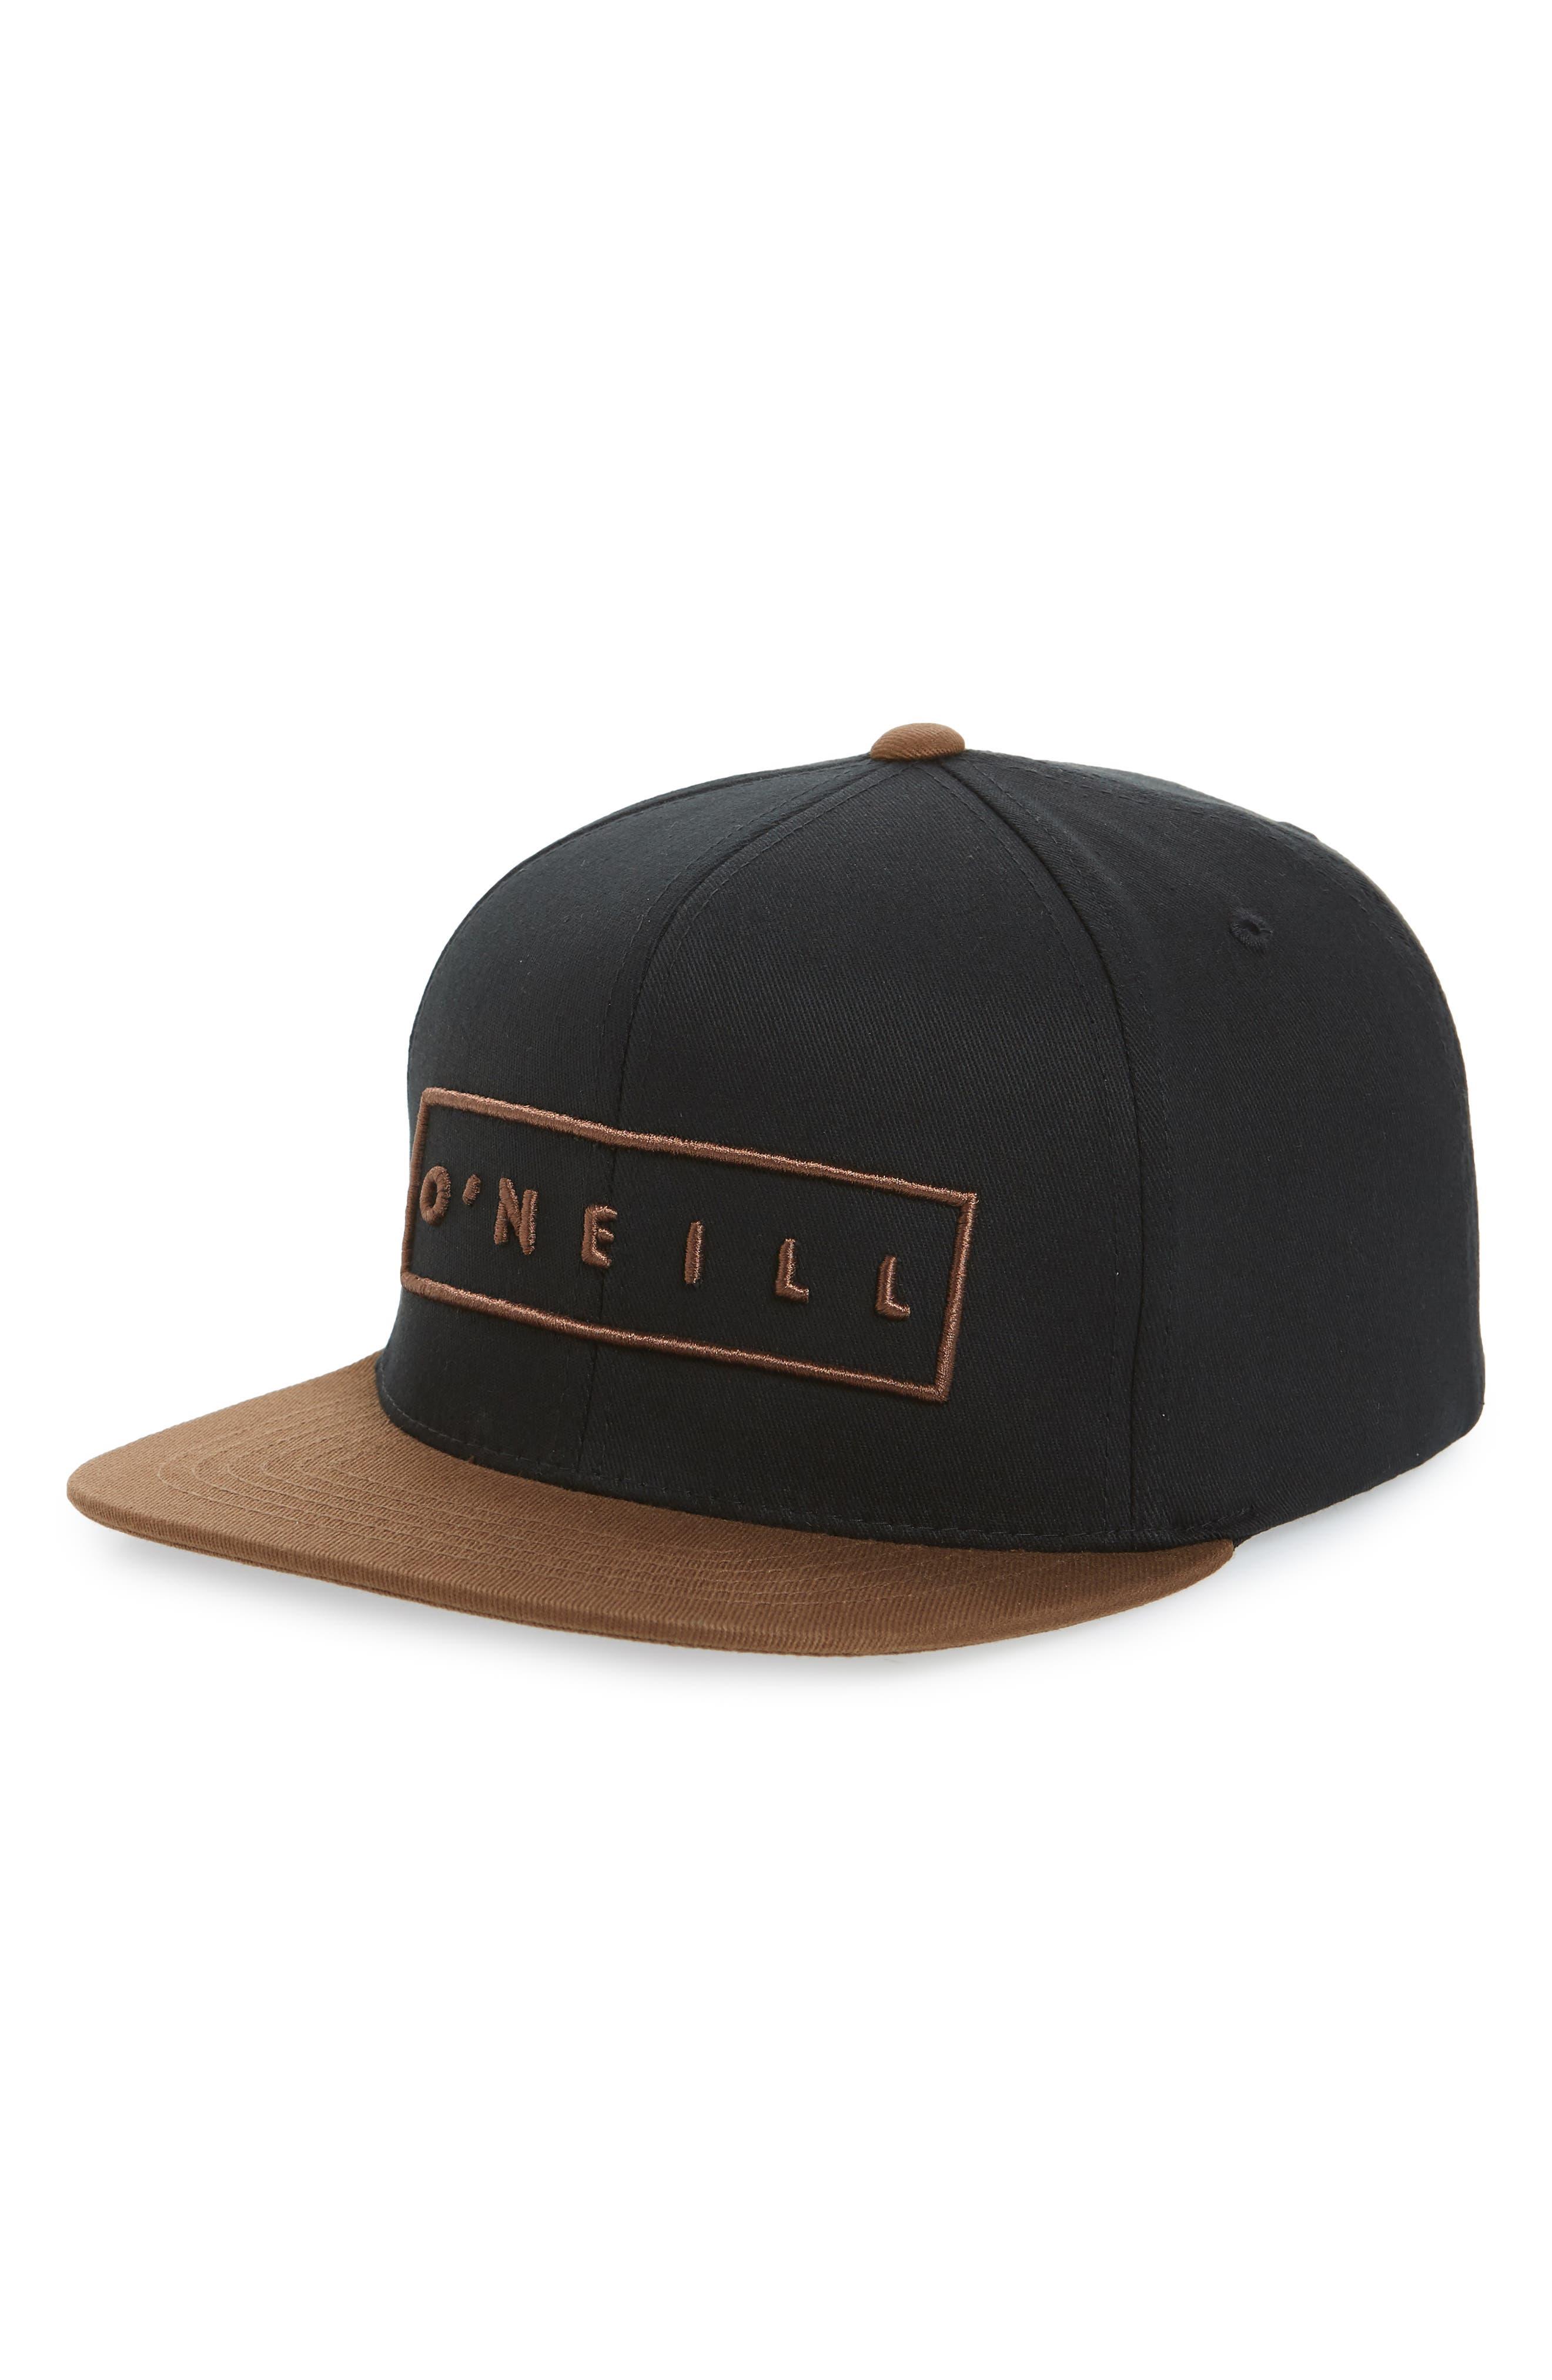 Hotbox Baseball Cap,                         Main,                         color, BLACK